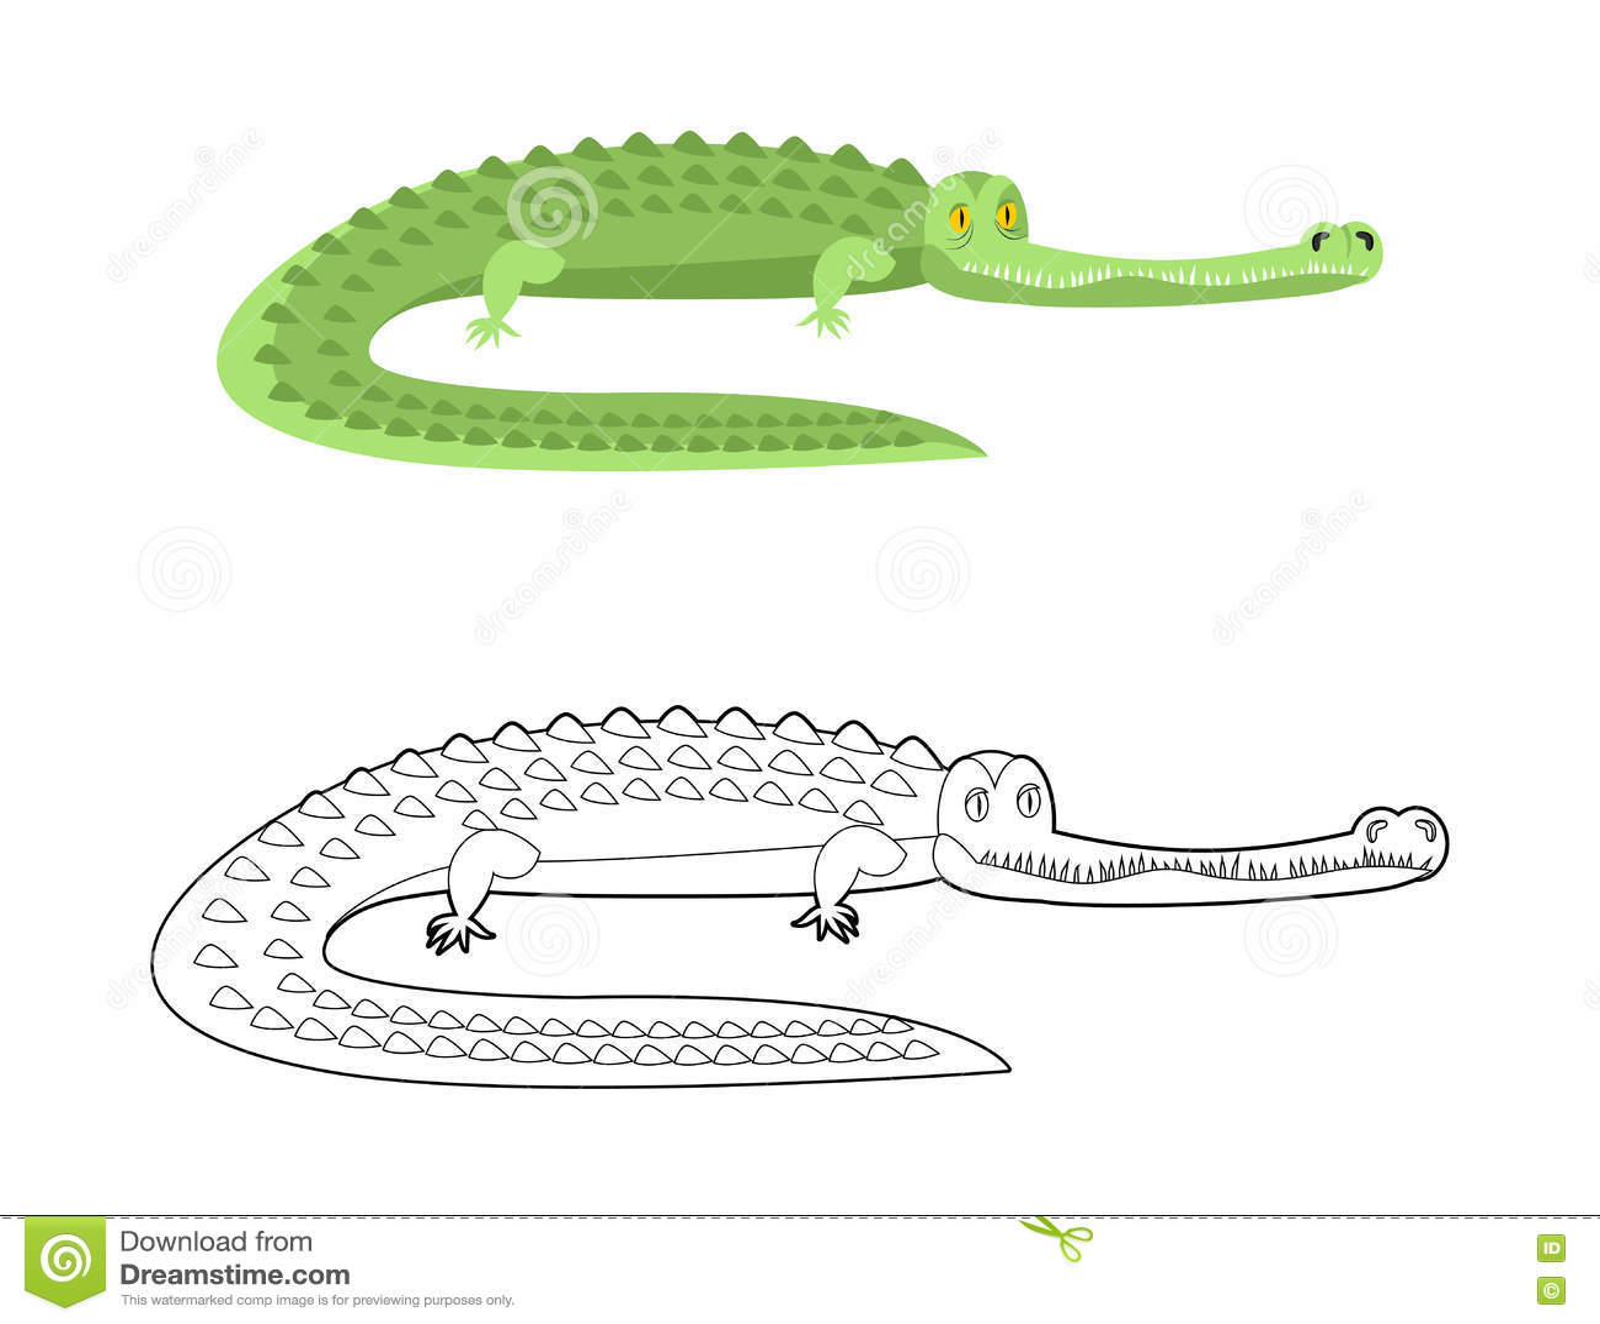 Krokodil-Malbuch Guter Kaiman Wildes Tier Grünes Reptil